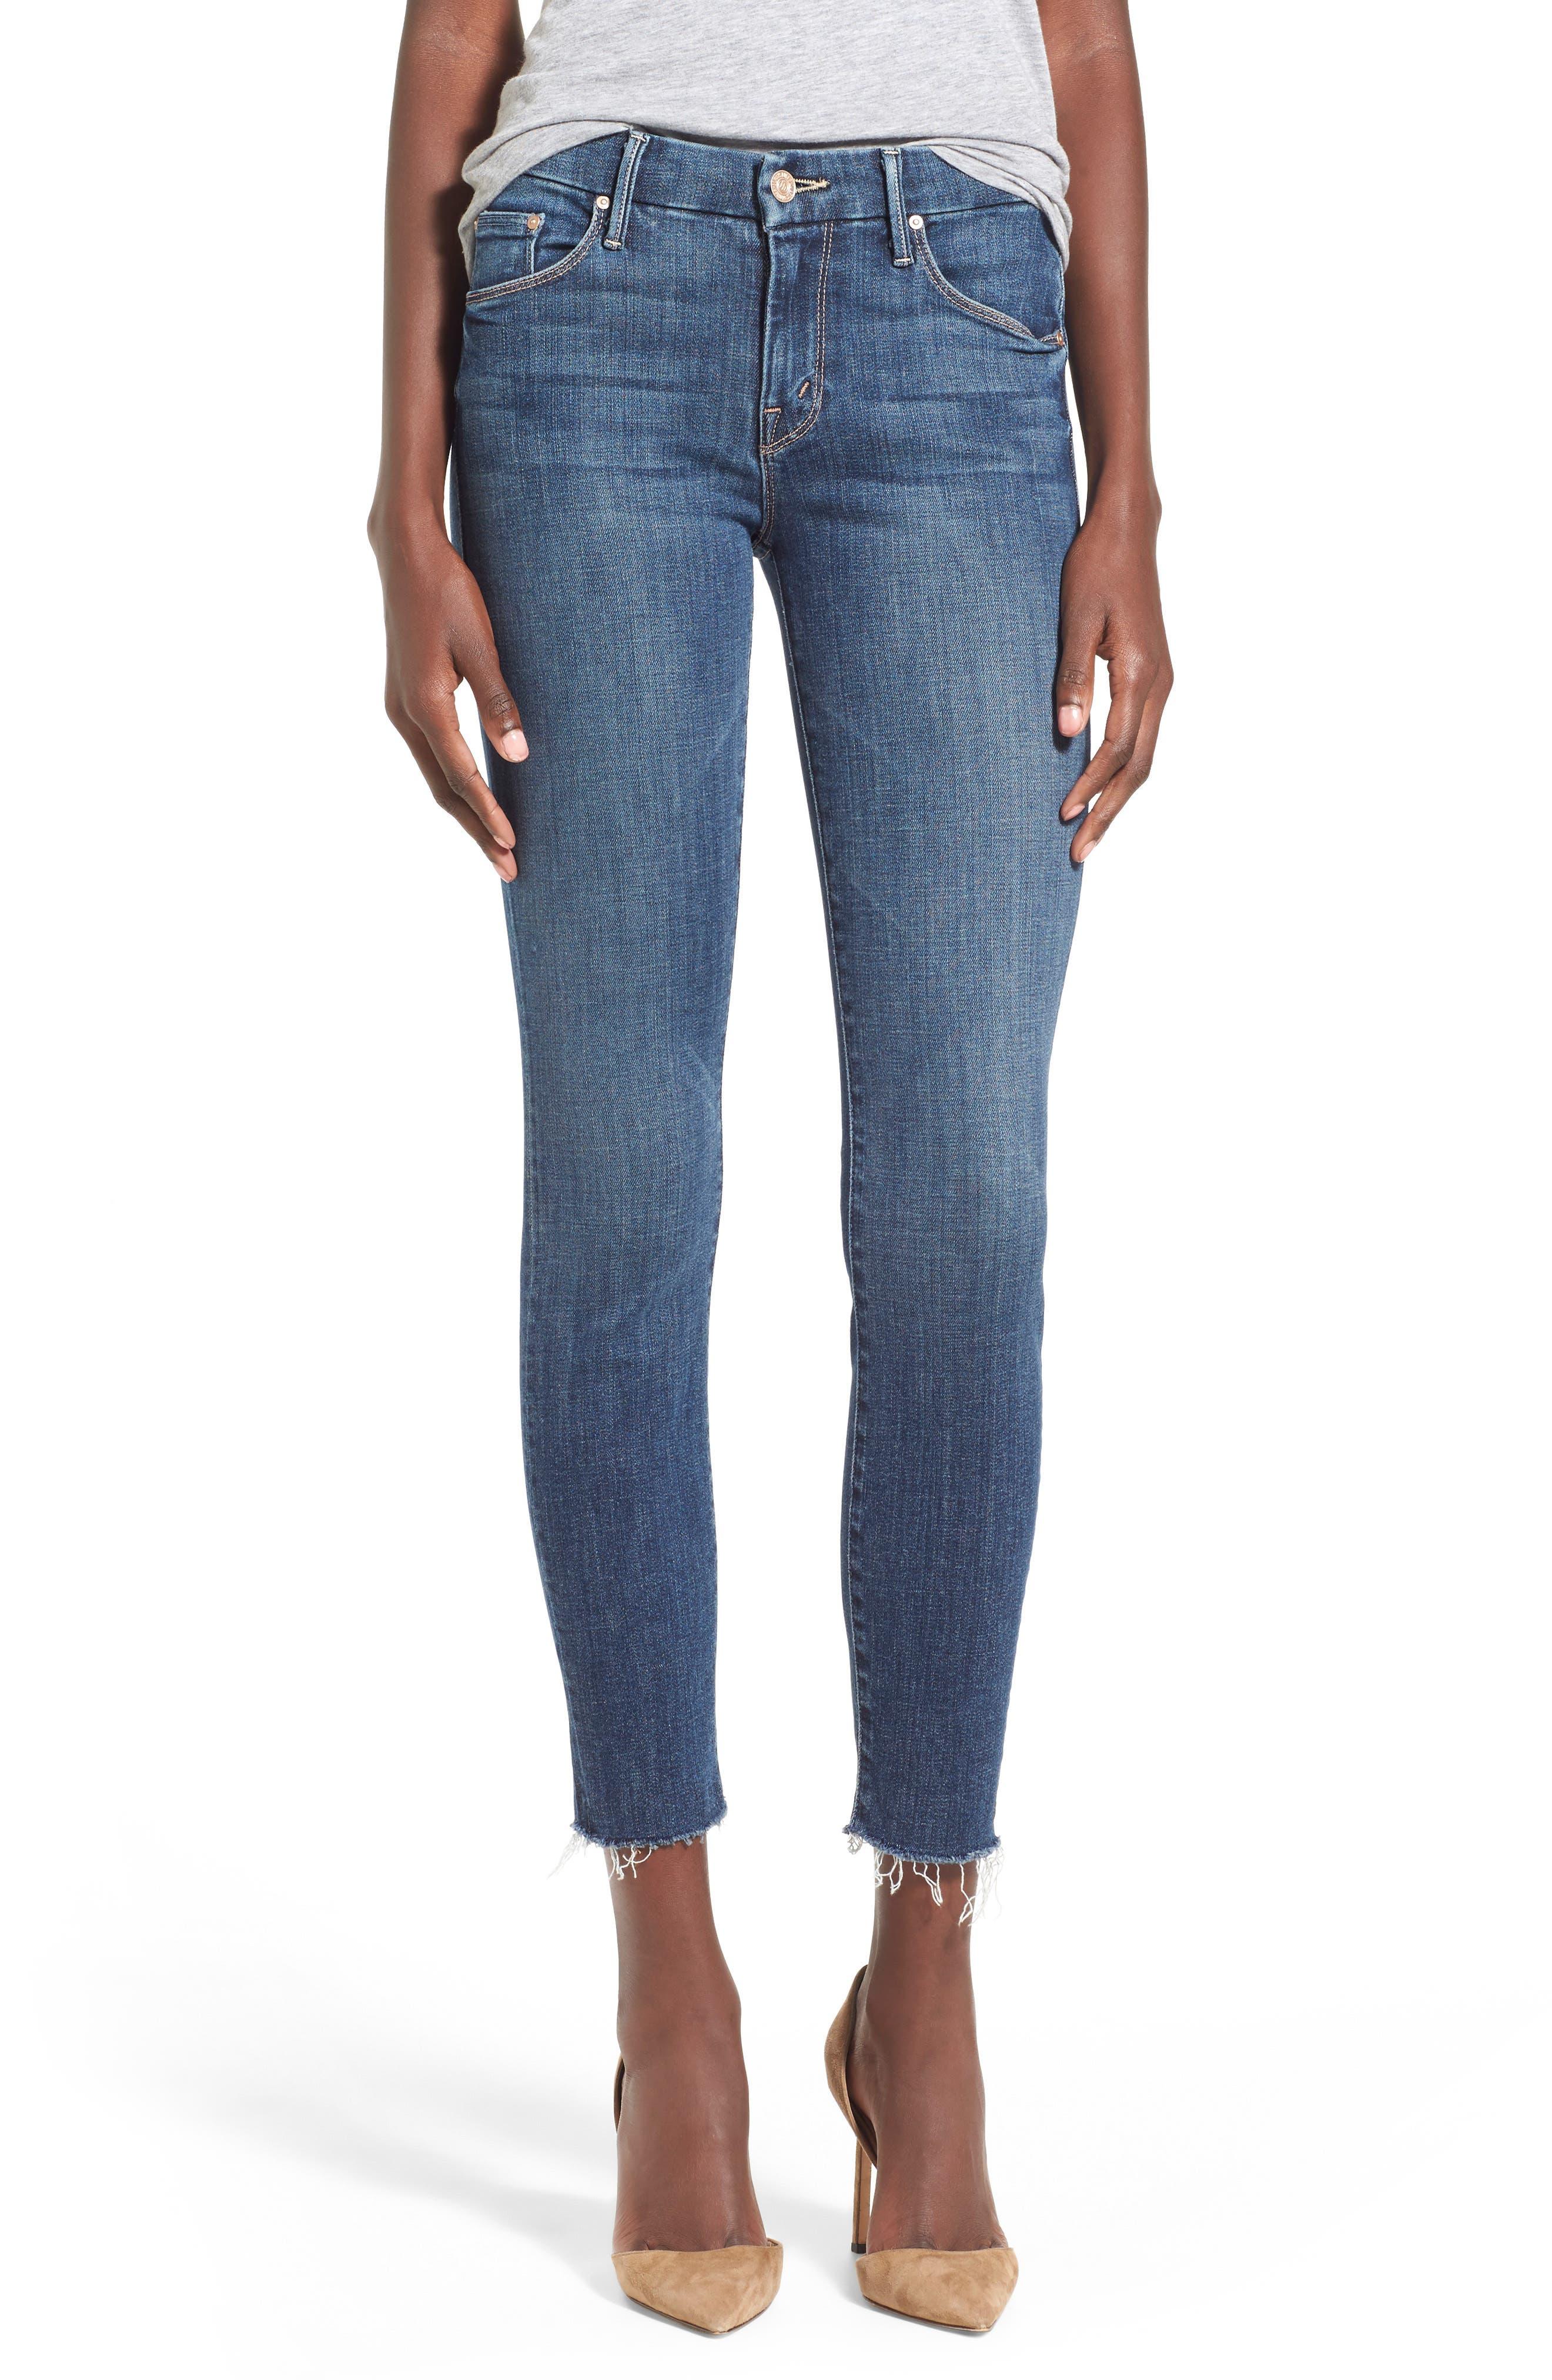 jeans, fashion, denim, fashion staple, mother